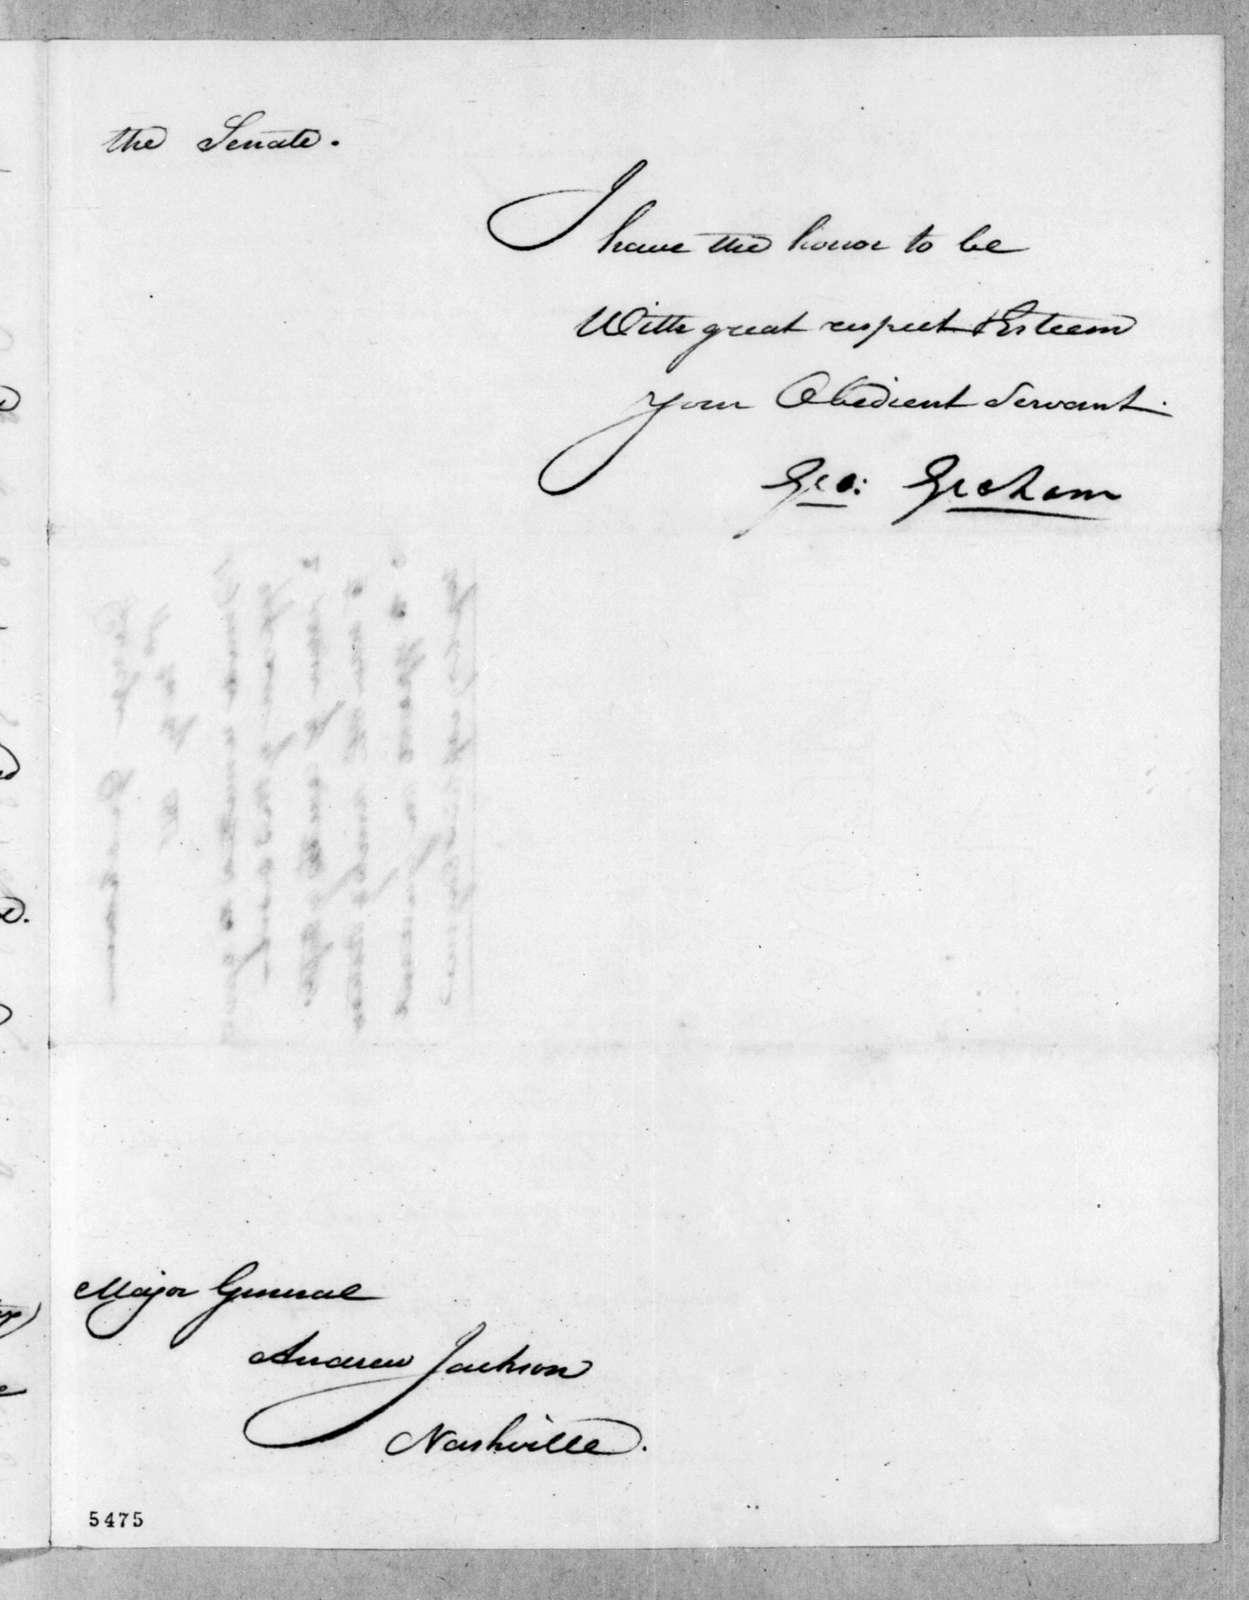 George Graham to Andrew Jackson, July 11, 1816